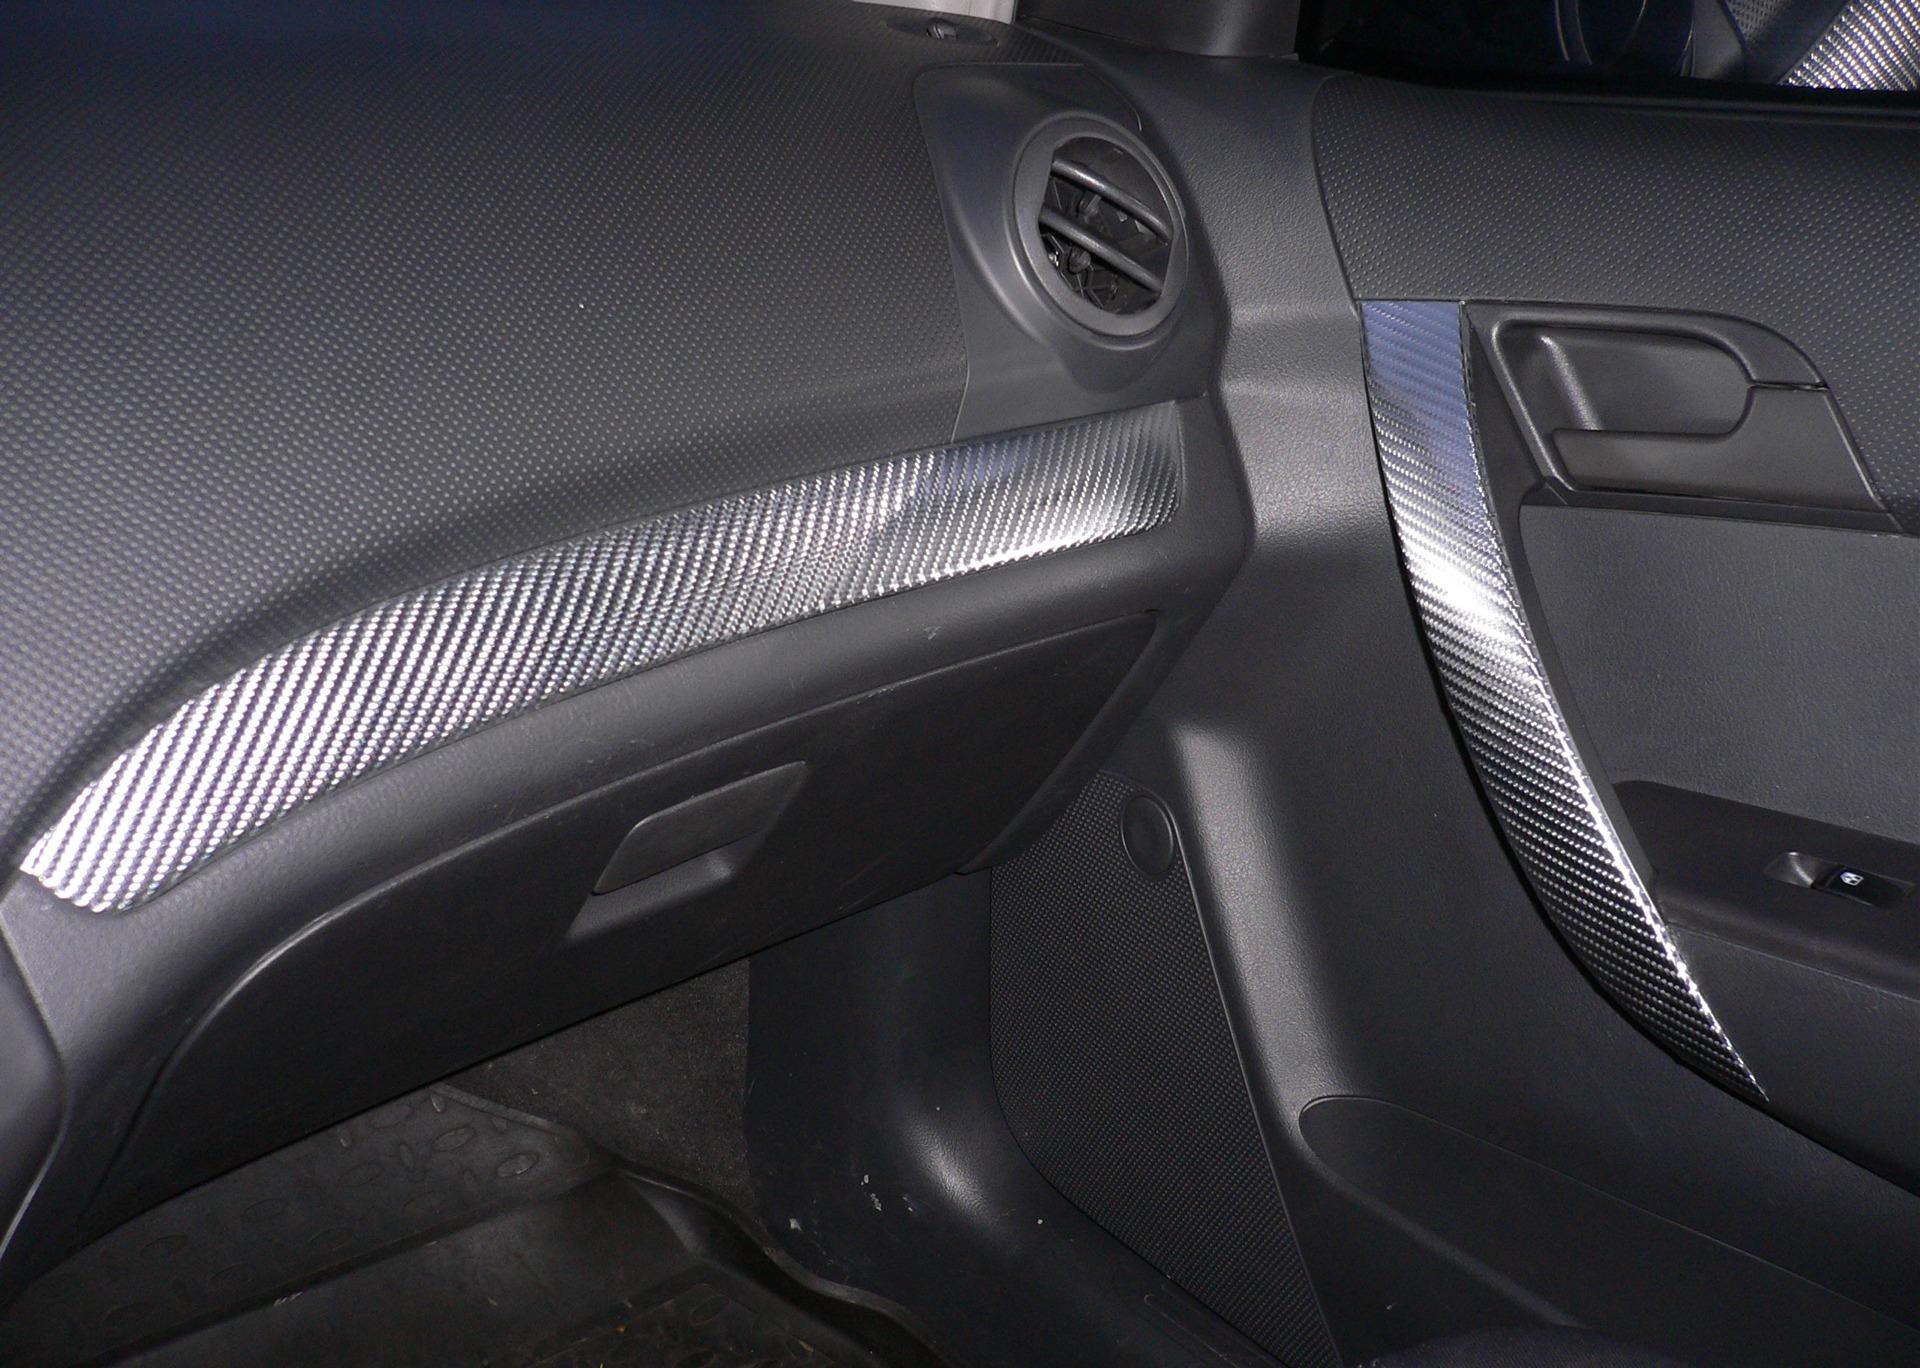 Оклейка плёнкой салон автомобиля своими руками